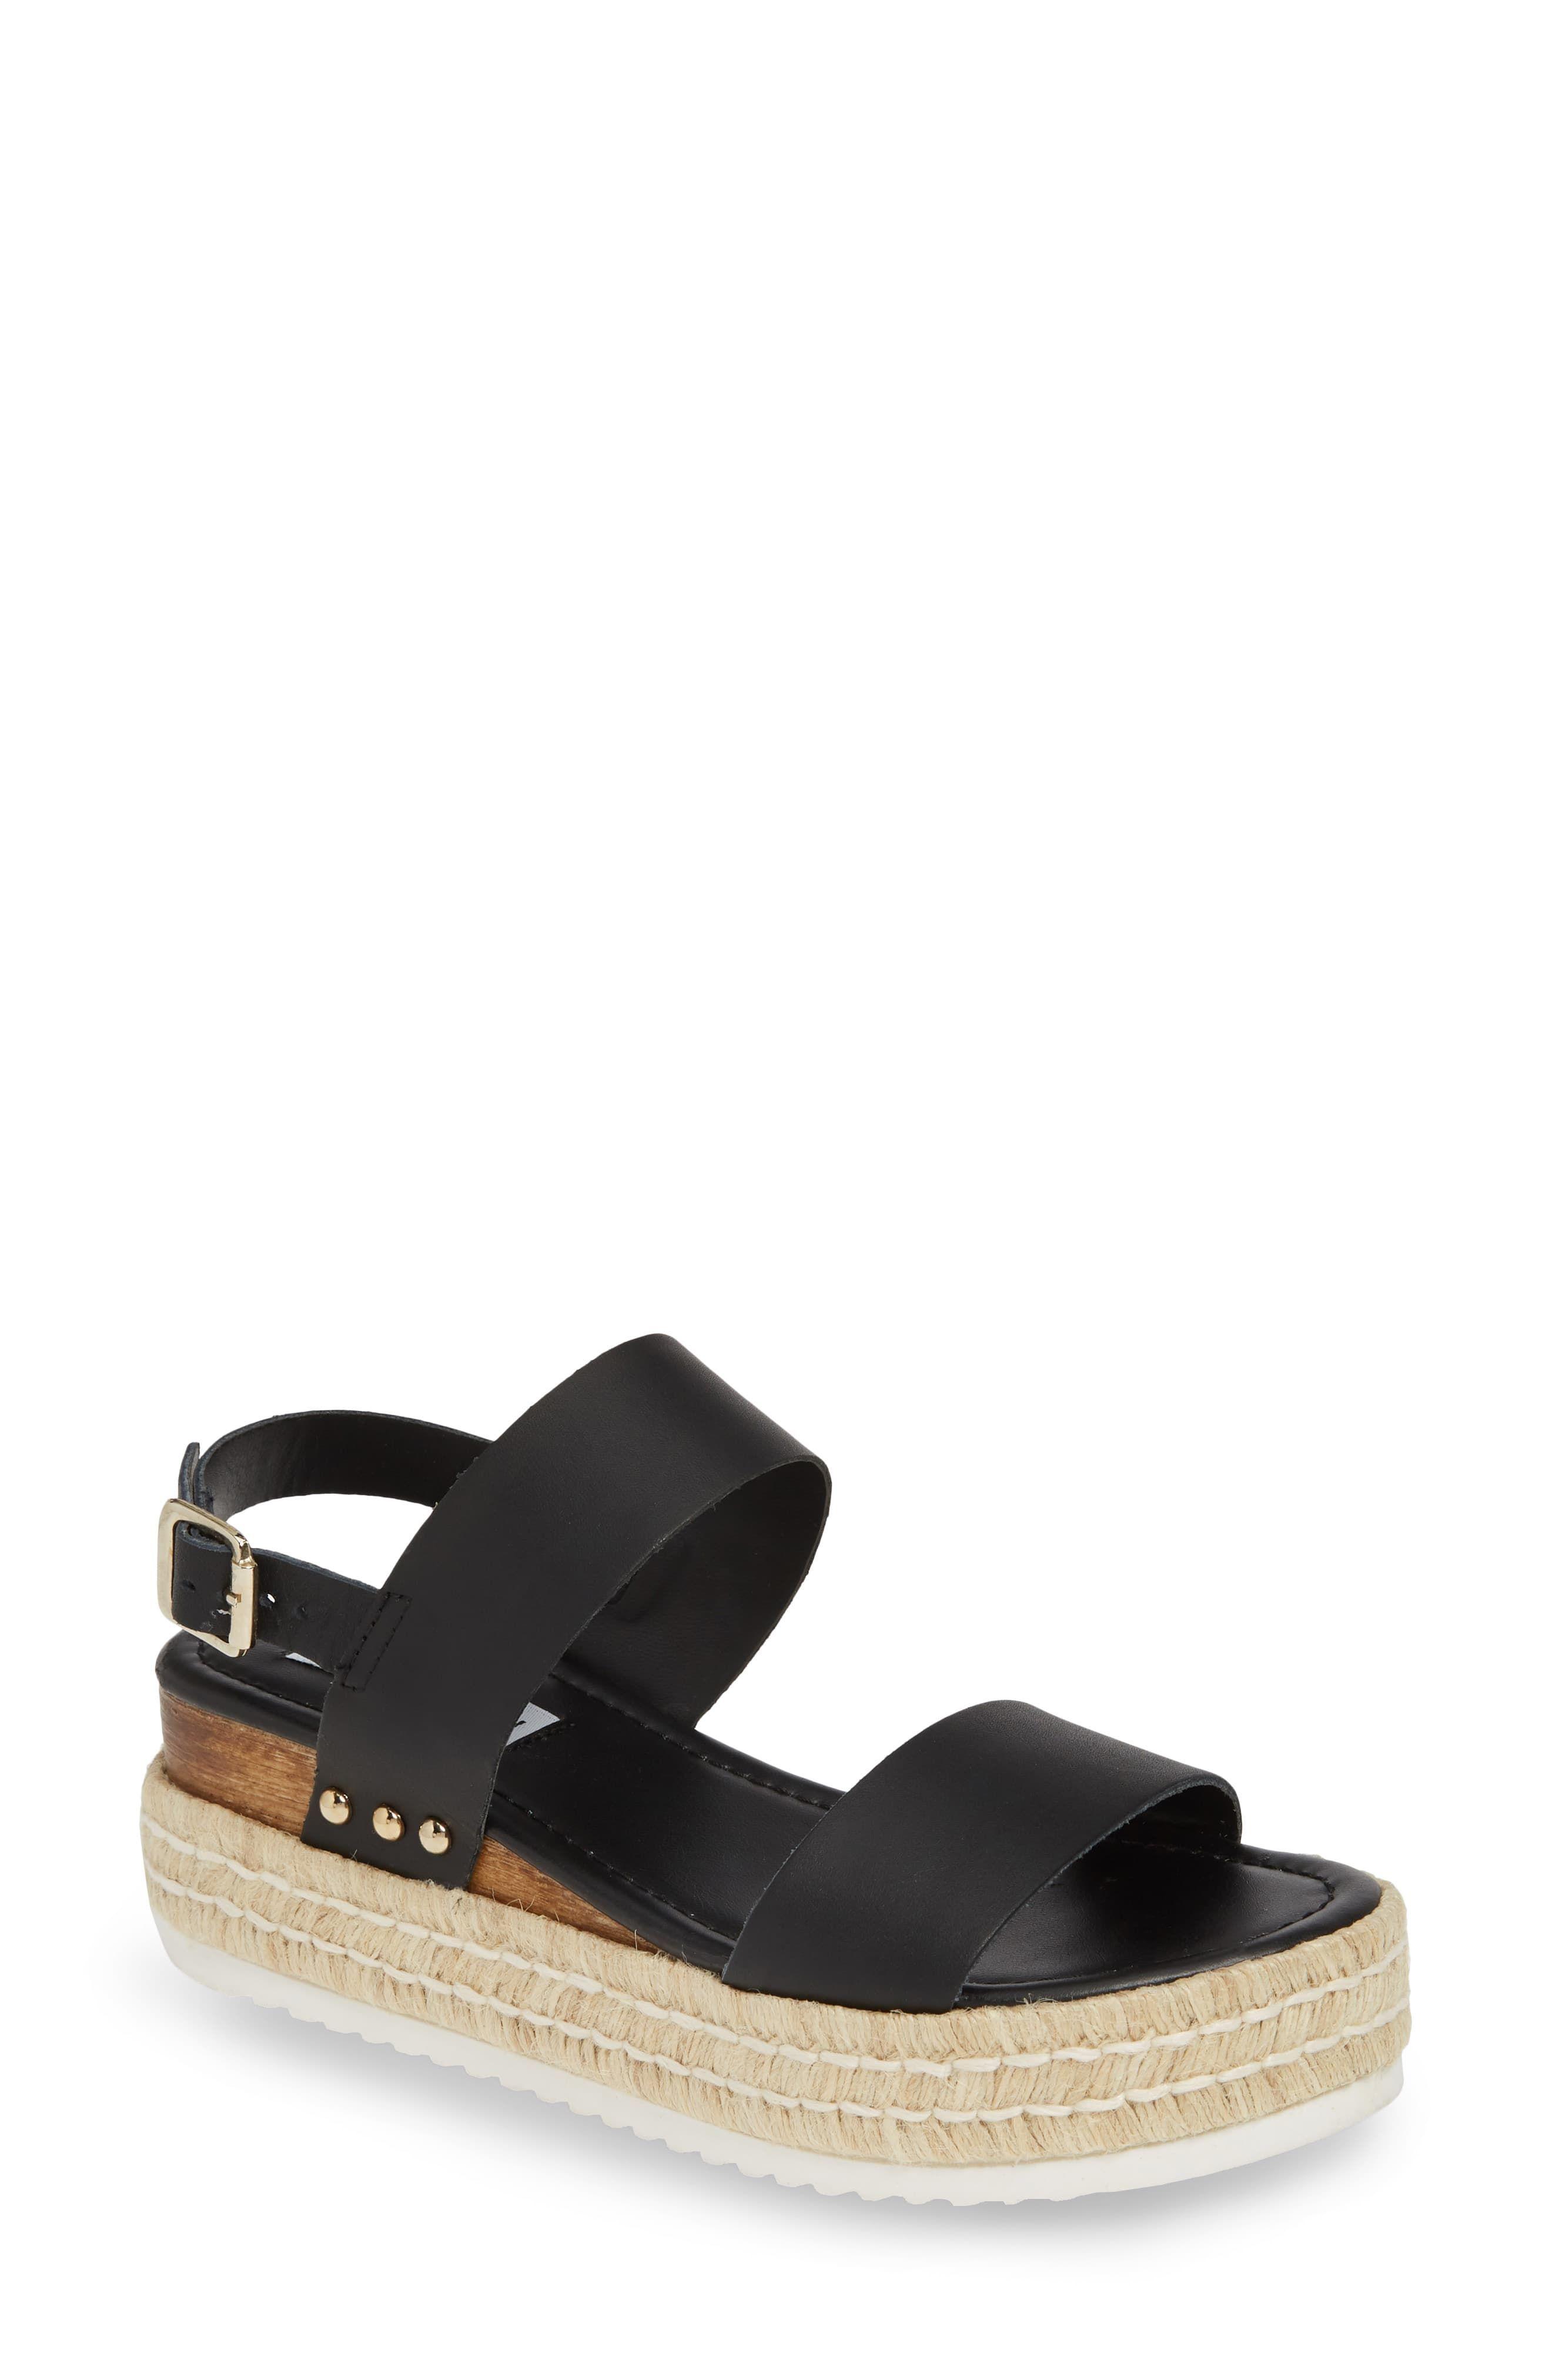 8ae1a1ad7735 Women's Steve Madden Catia Espadrille Sandal, Size 5.5 M - Black in ...